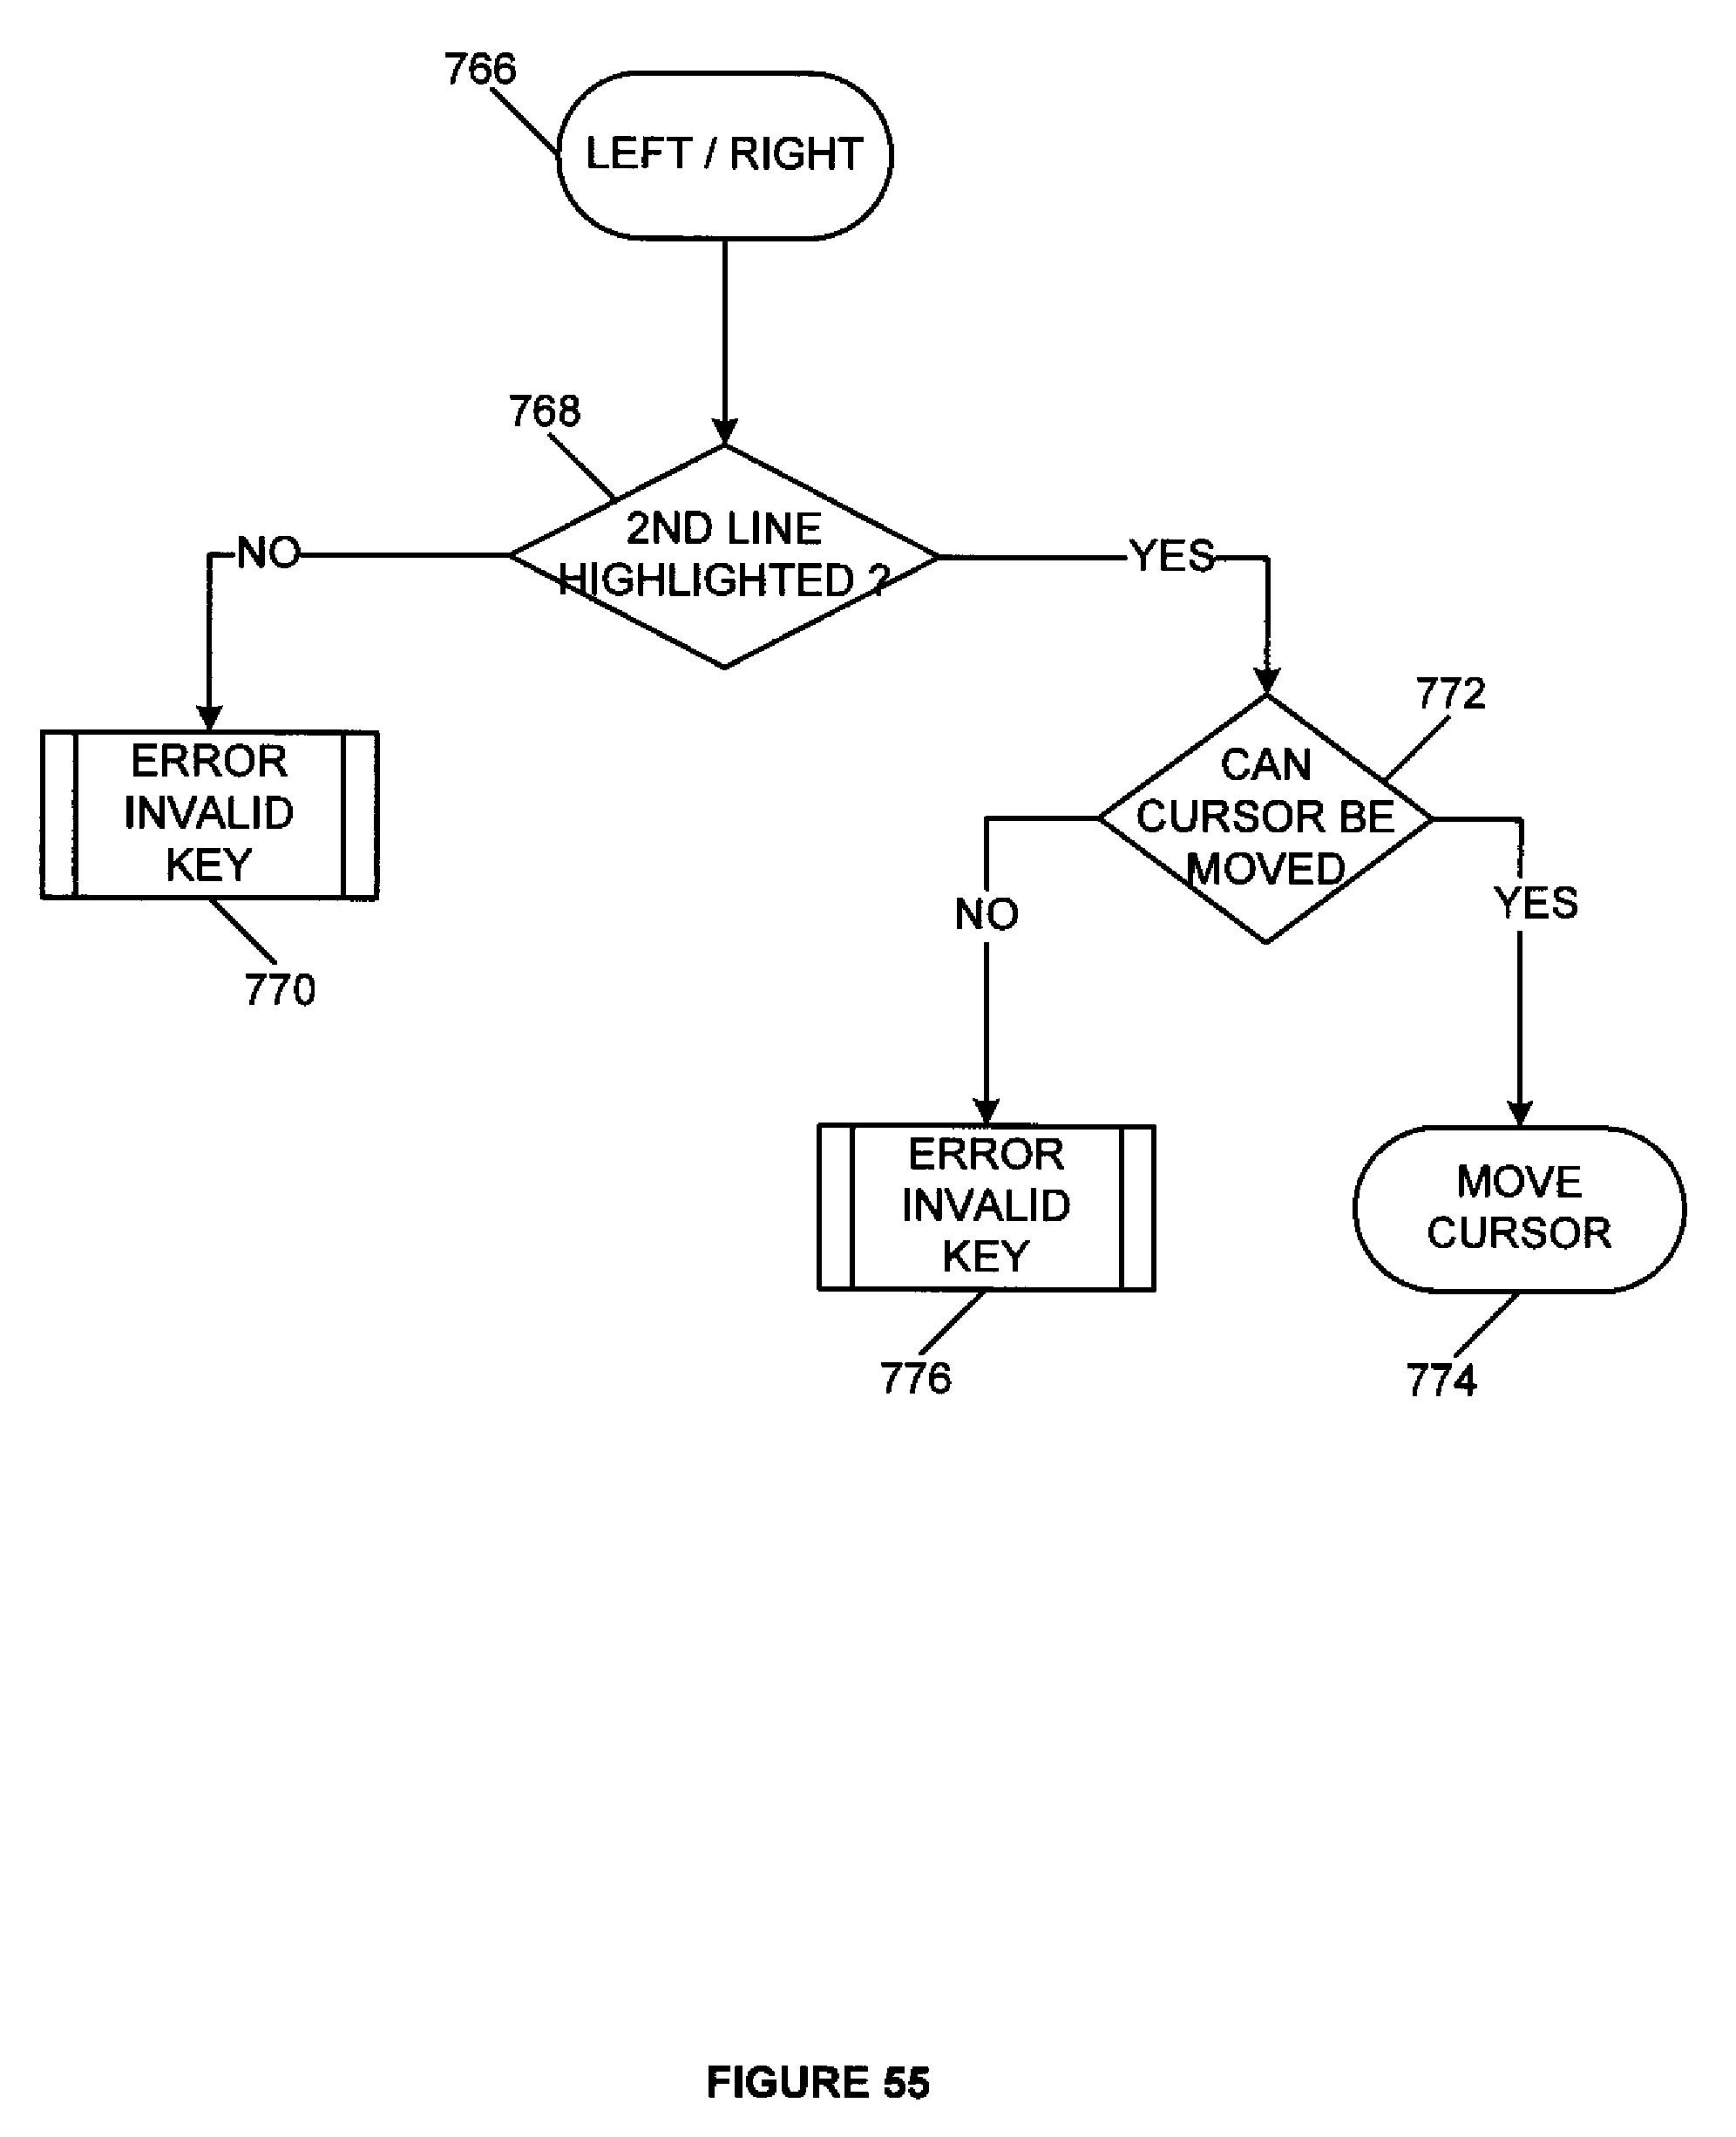 Wiring Diagram for Eccotemp L5 Cb 3465] Shurflo Pump Wiring Diagram Free Diagram Of Wiring Diagram for Eccotemp L5